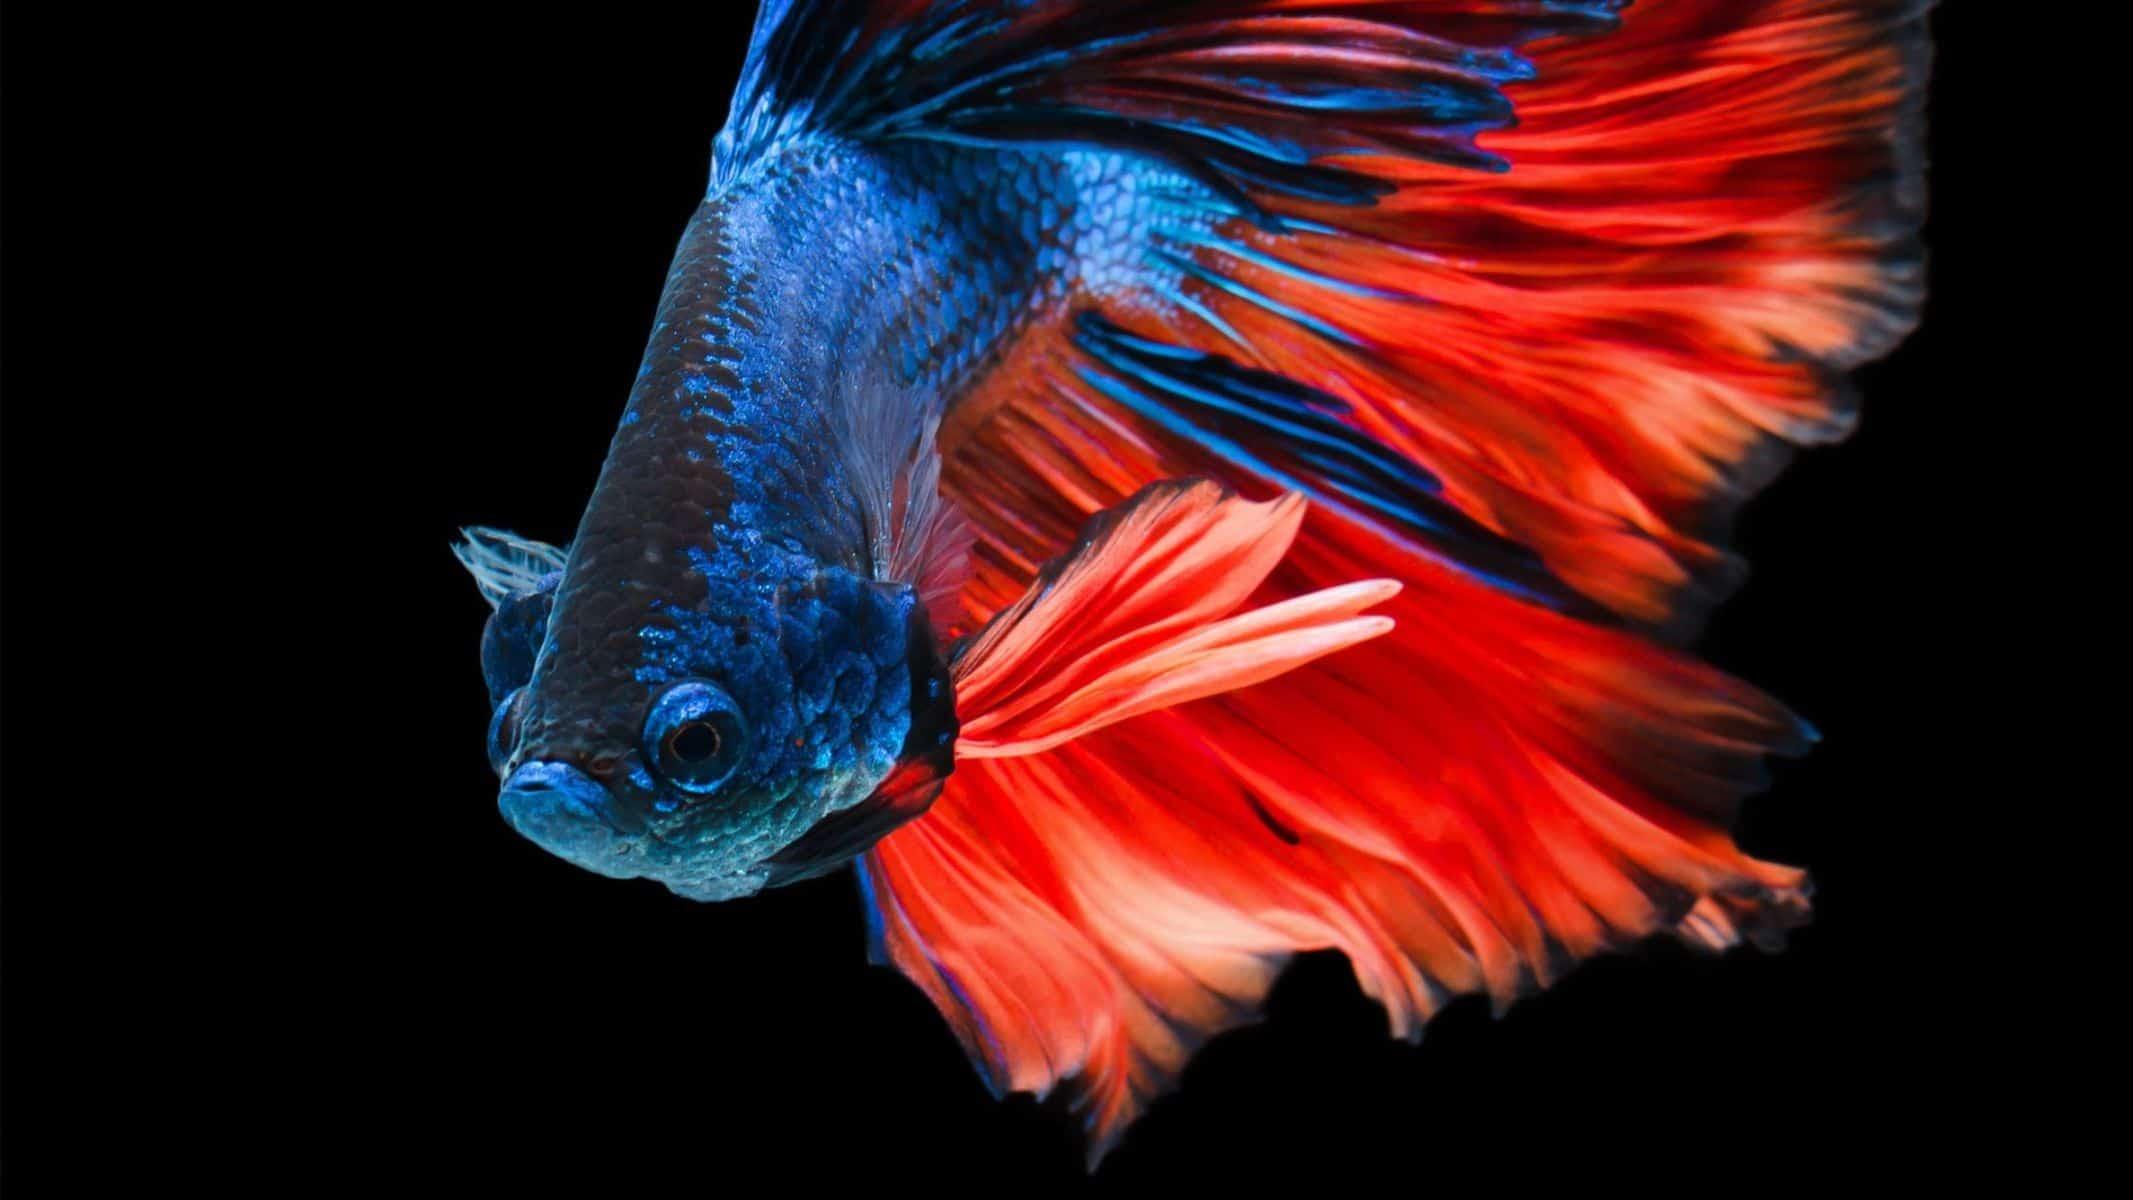 Betta Fish with Graphite Disease